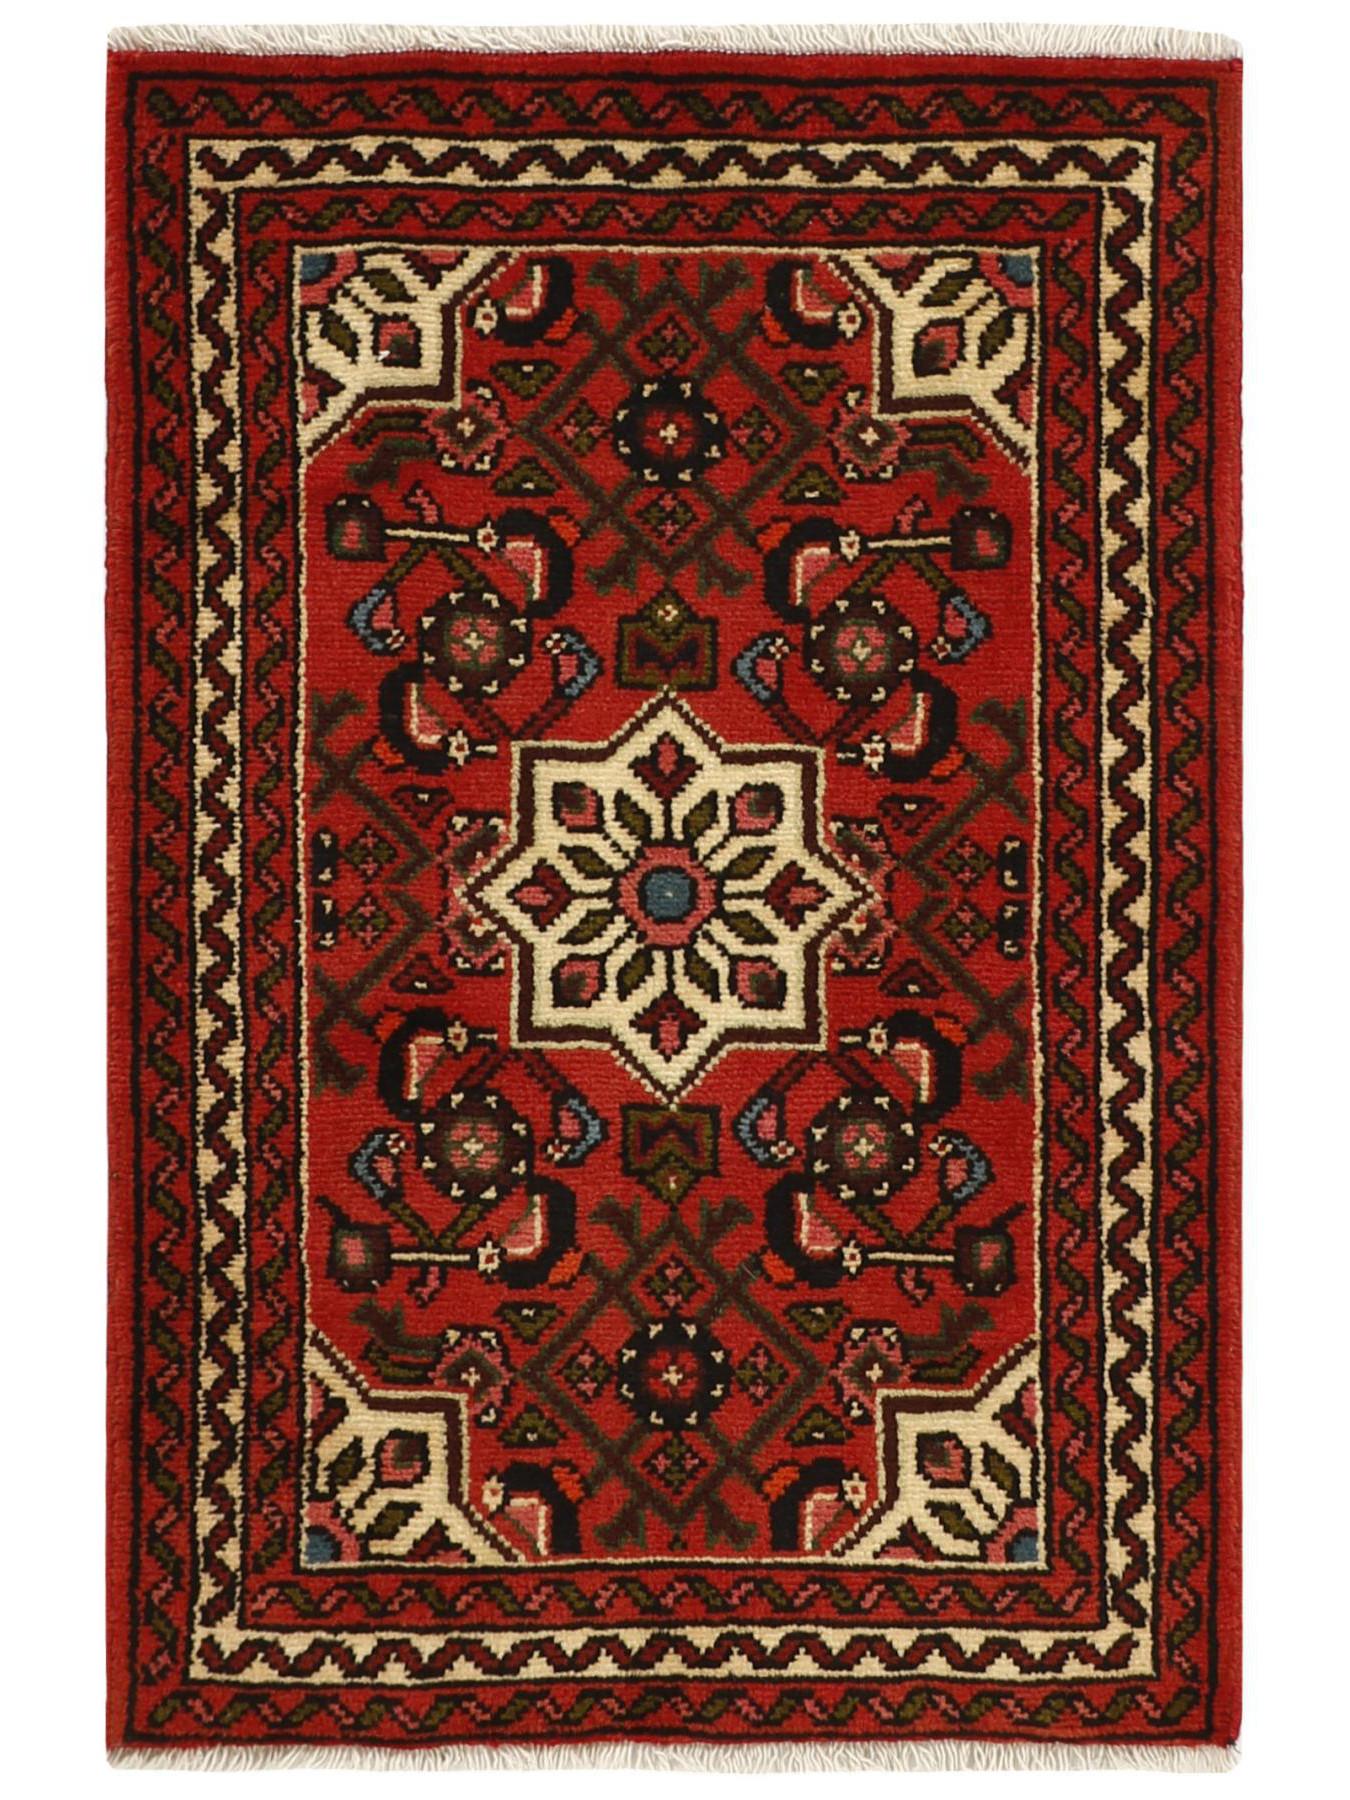 Persian carpets - Hosseinabad